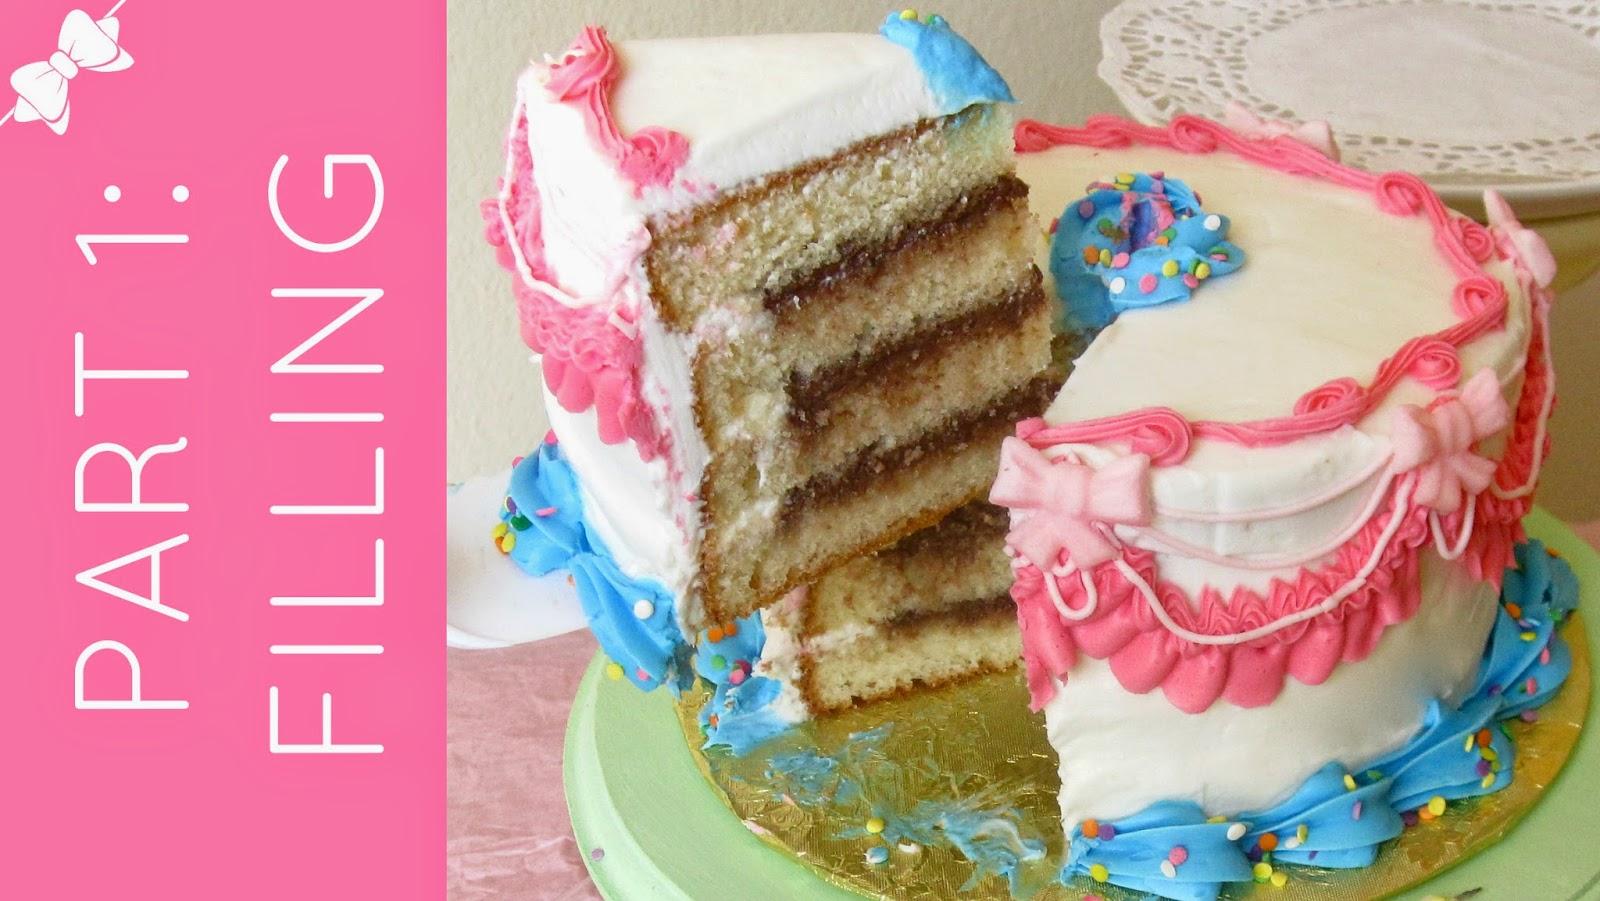 http://blog.dollhousebakeshoppe.com/2015/04/cake-decorating-101-part-1-how-to-level.html